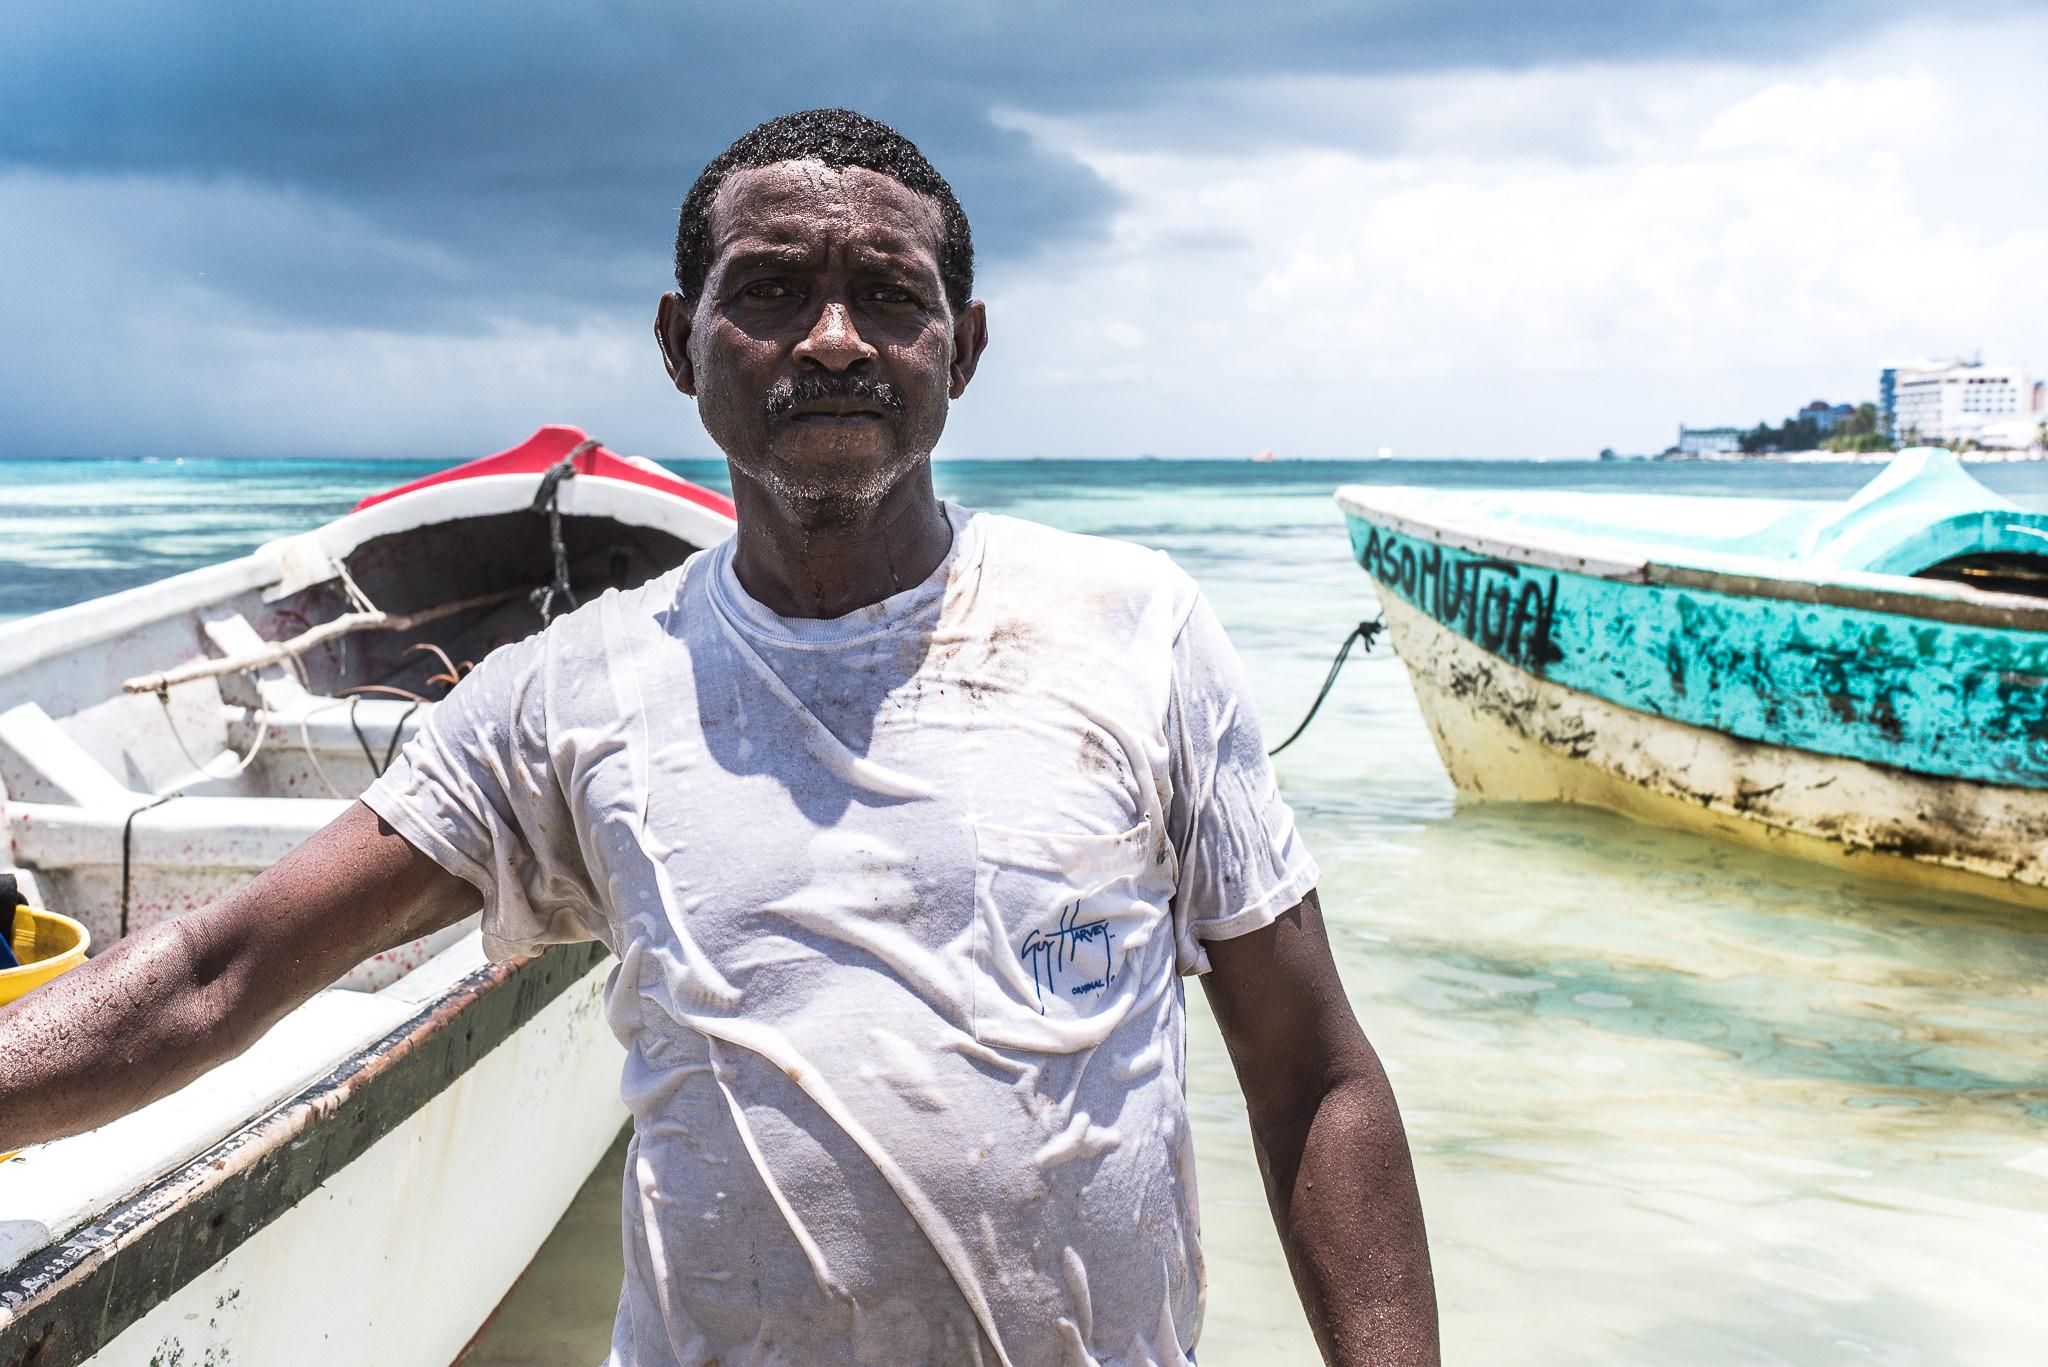 barco_sai_sanandres_colombia_caribe_fisherman_haya_sky_blue_isla_island_00006.jpg